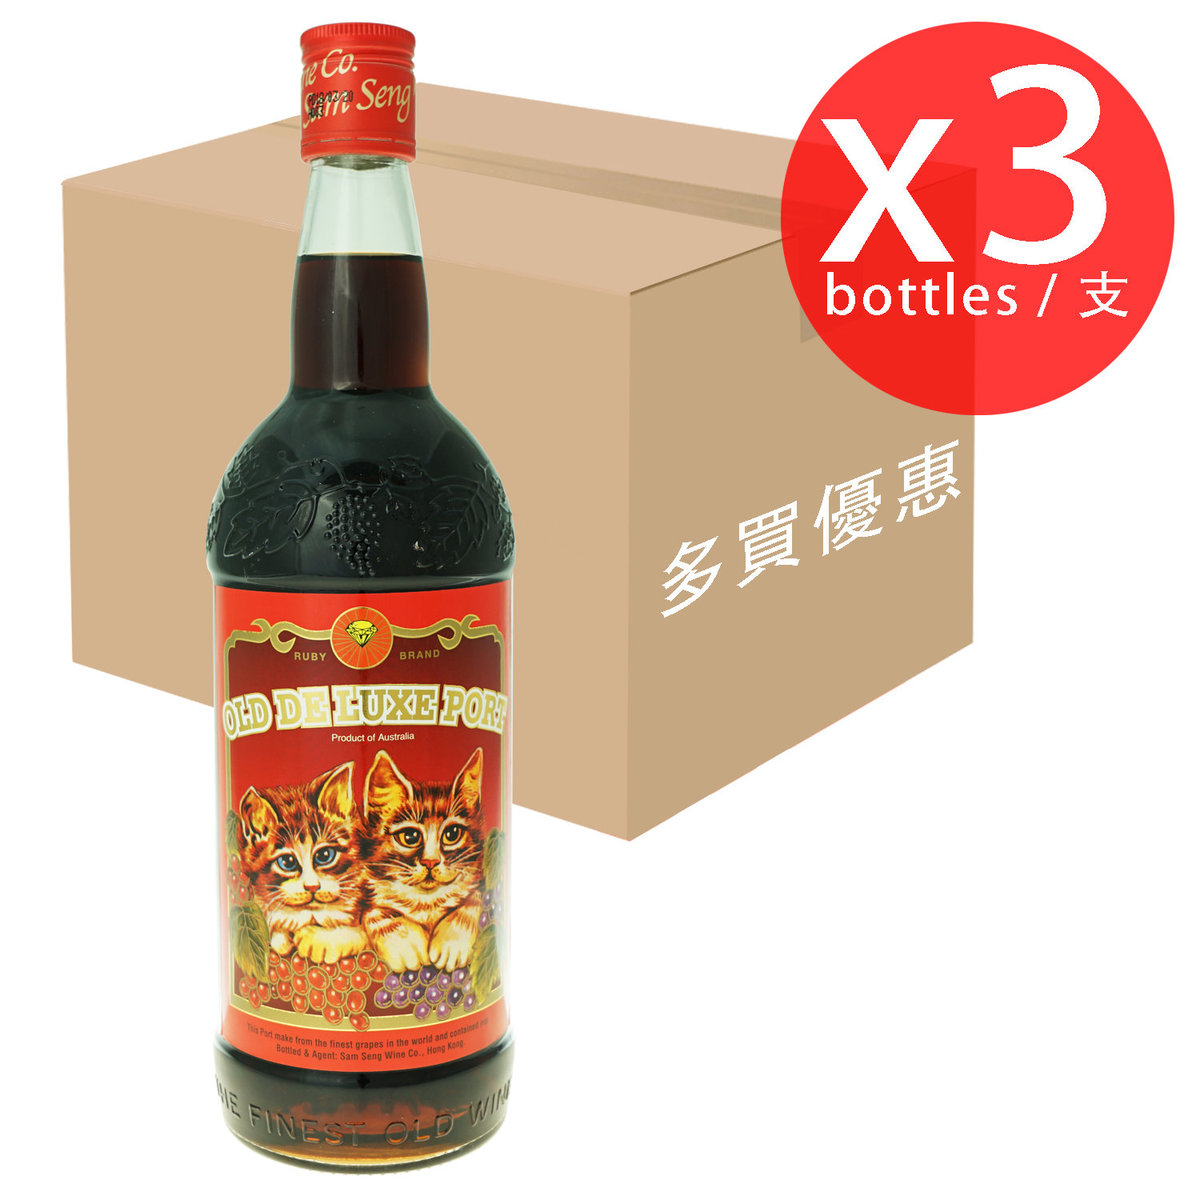 寶石雙貓紅砵酒 750ml X 3 OLD DELUXE PORT